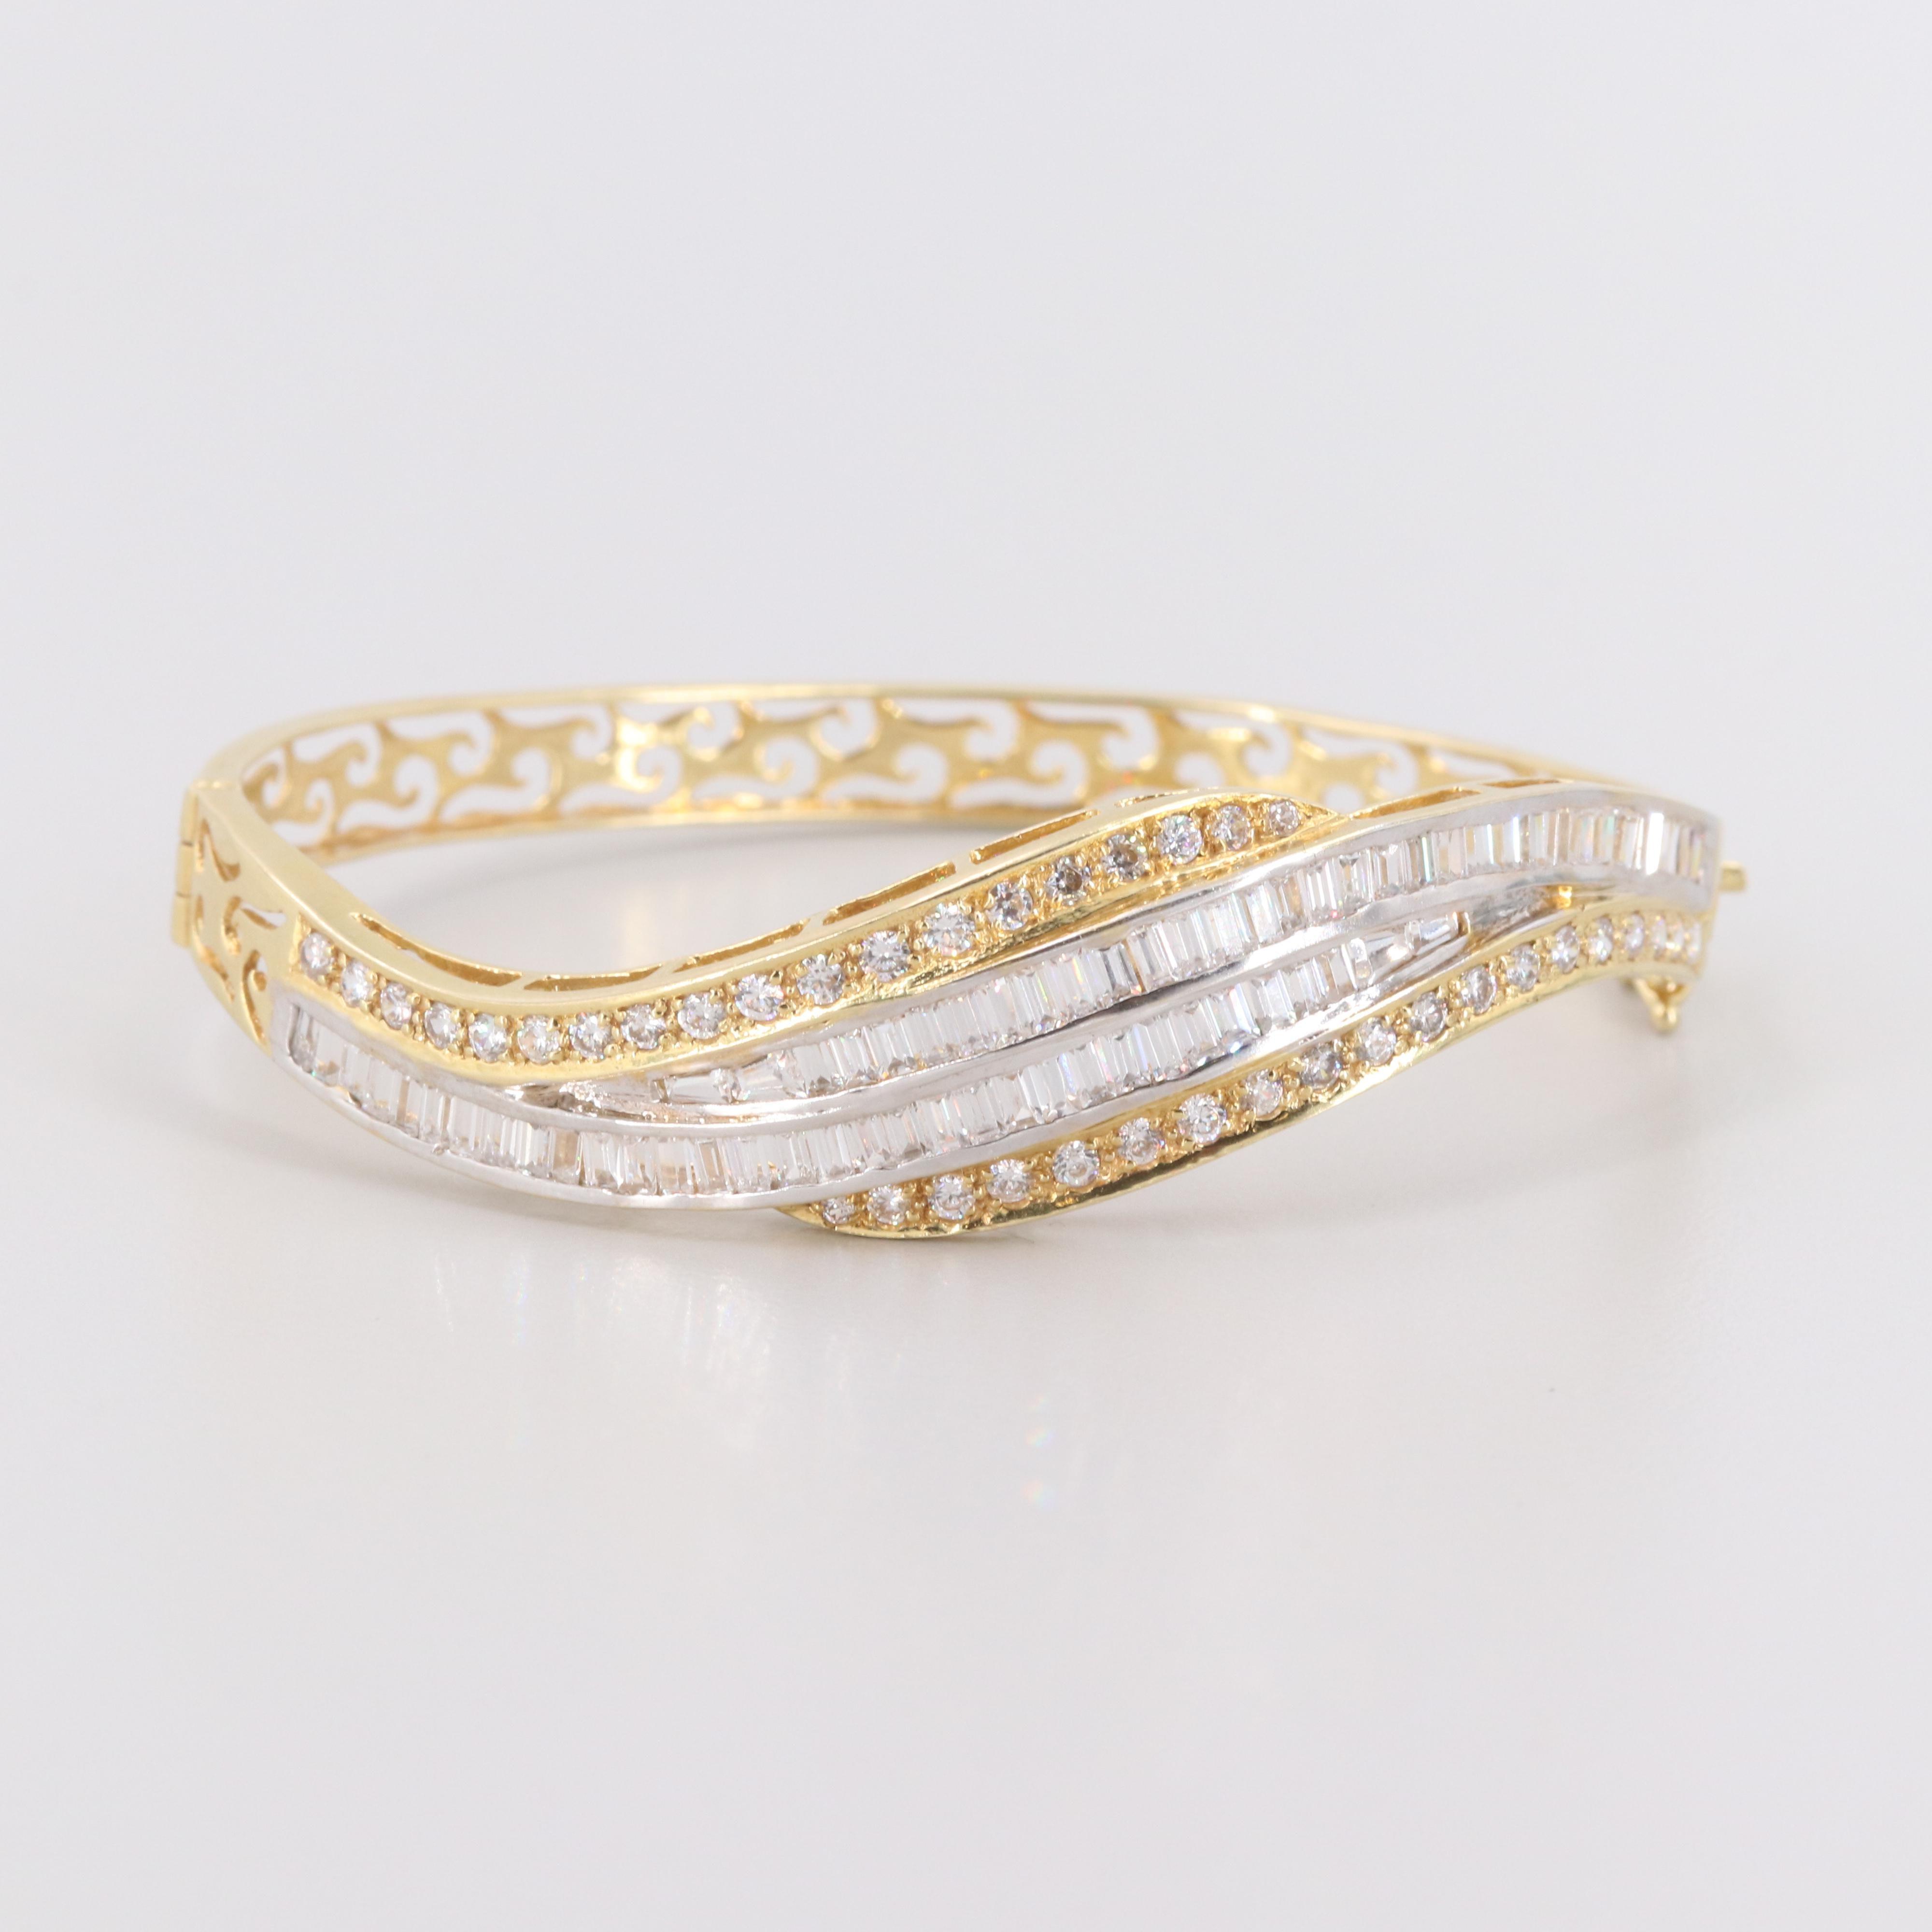 18K Yellow Gold Cubic Zirconia Bangle Bracelet